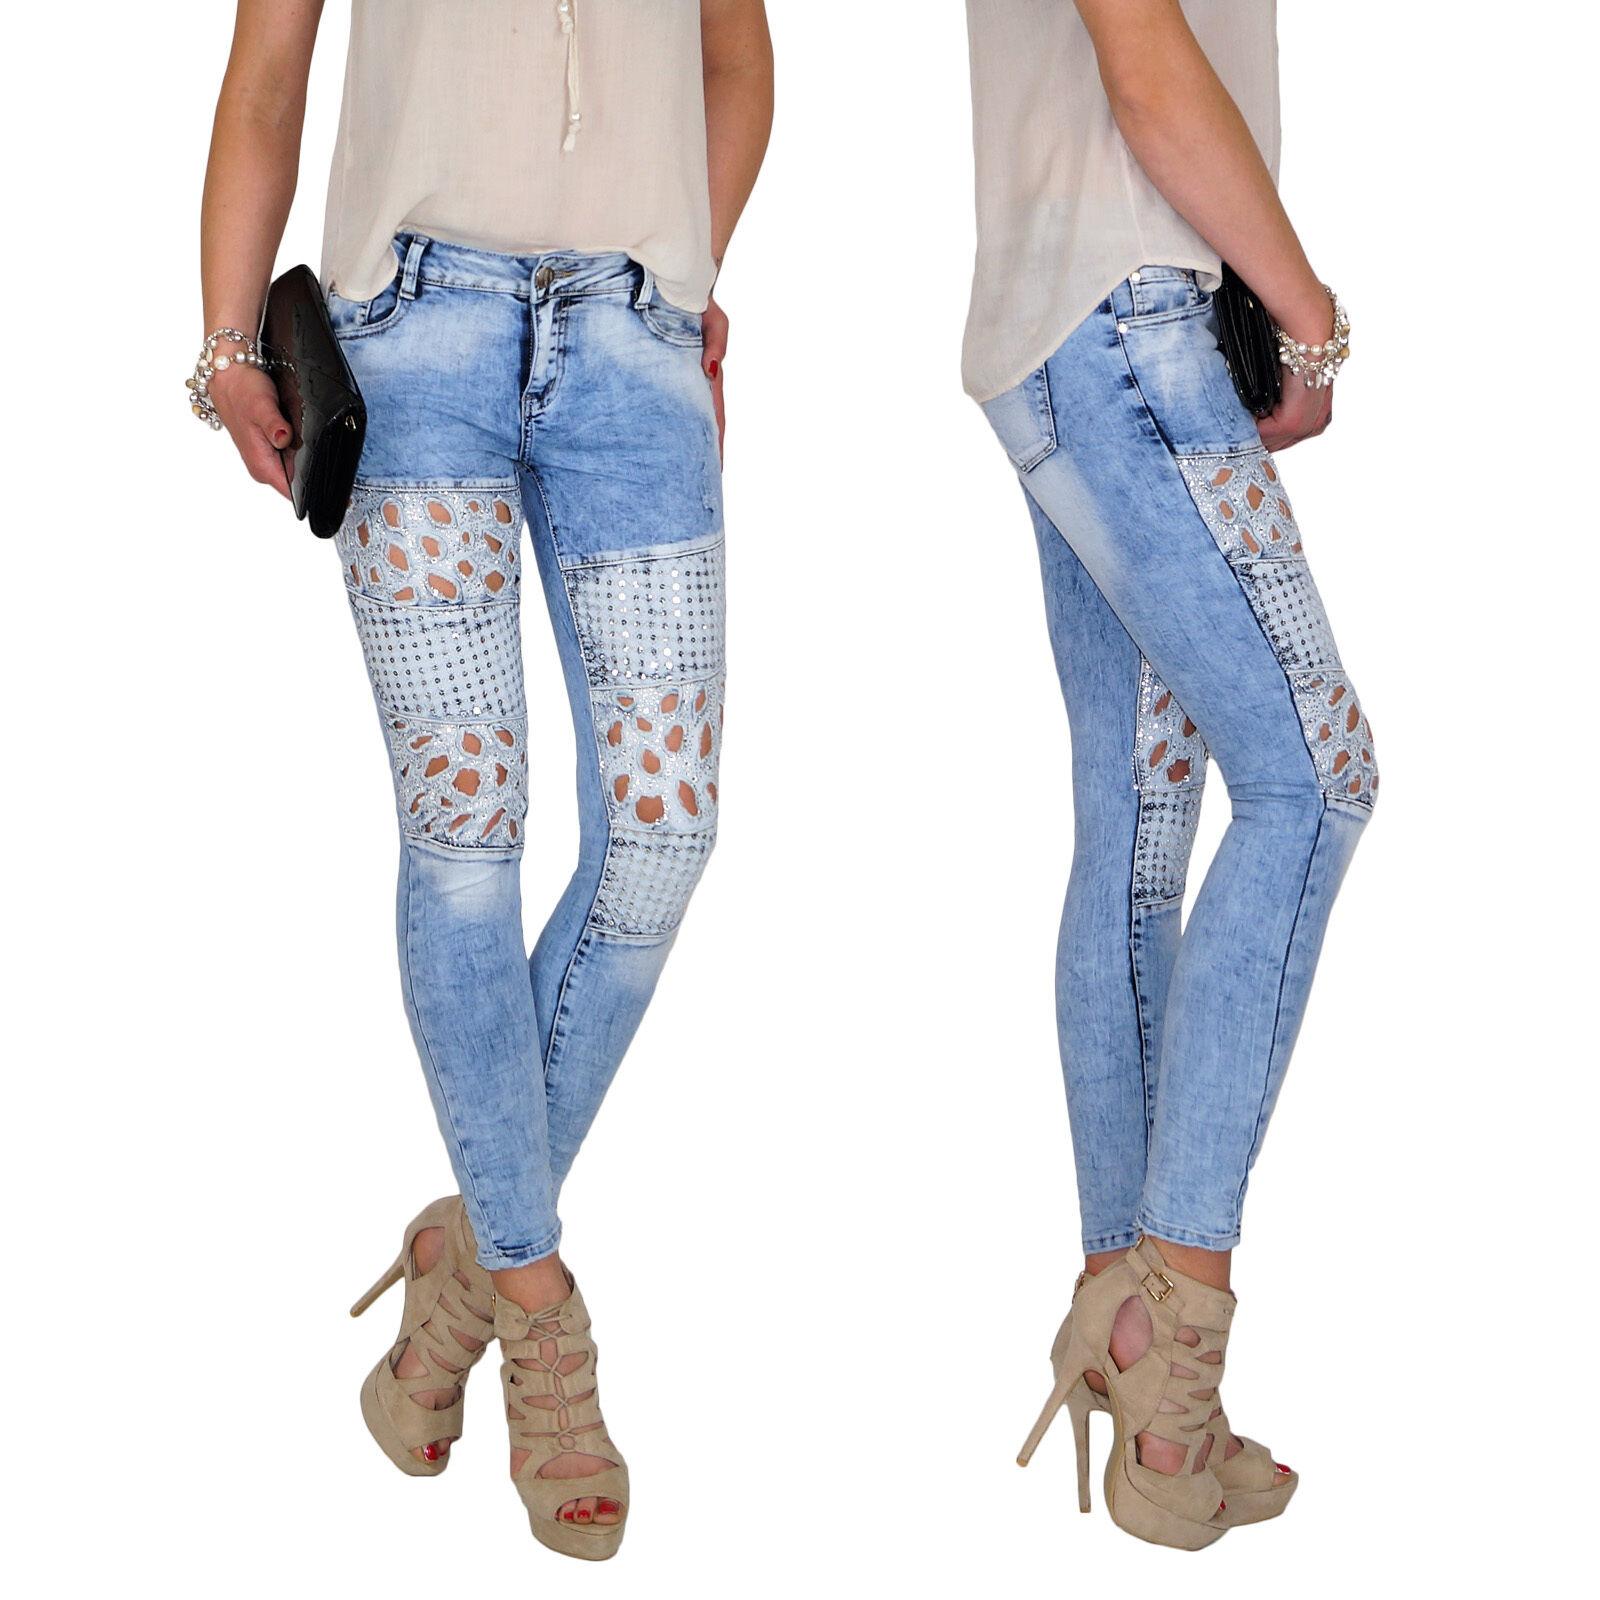 Damen Stretch Cutouts Skinny Slim Fit Hüft Jeans Hose Röhrenjeans Röhre E111